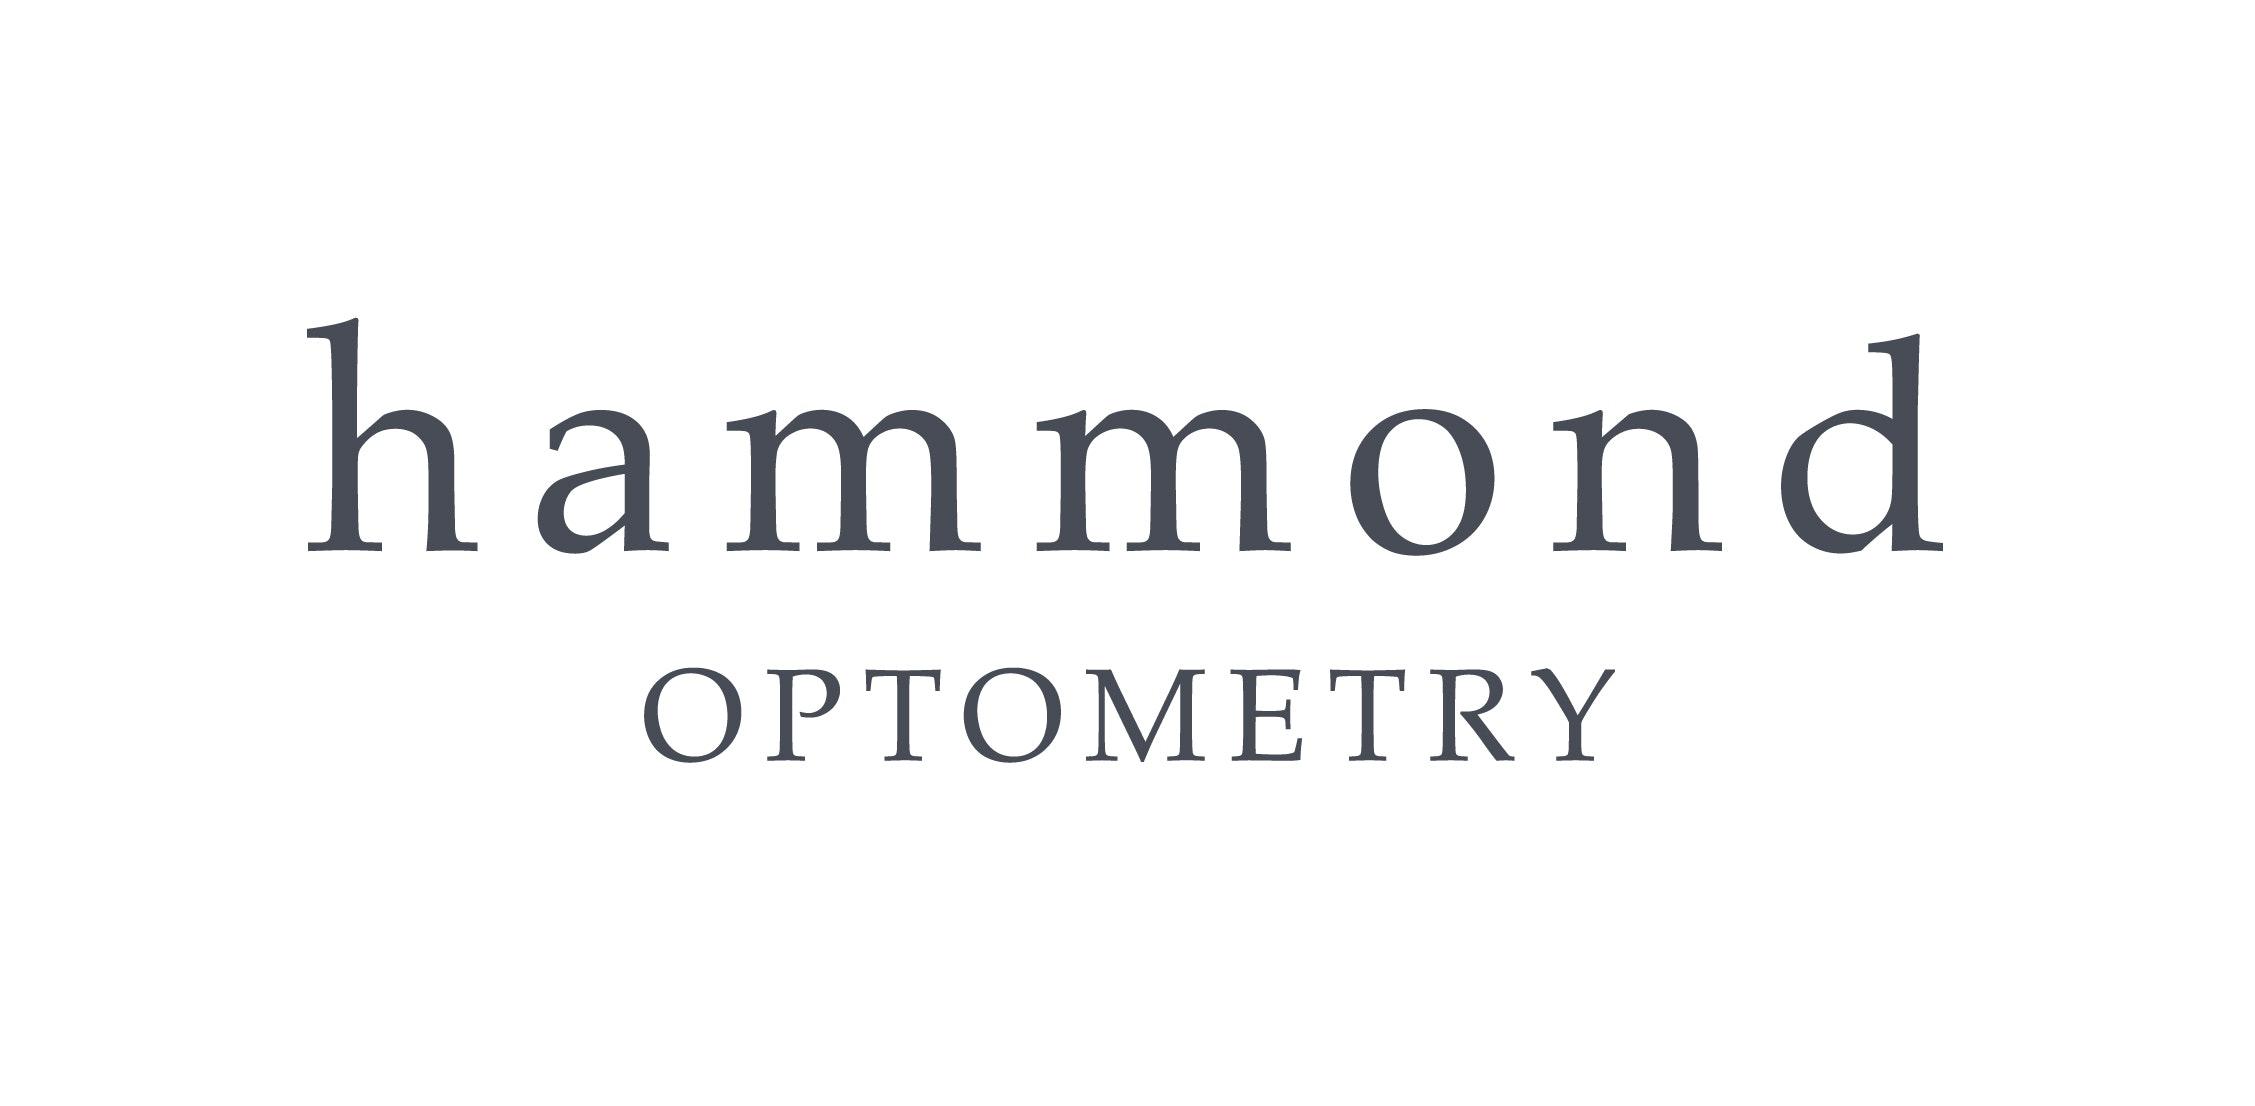 Hammond Optometry